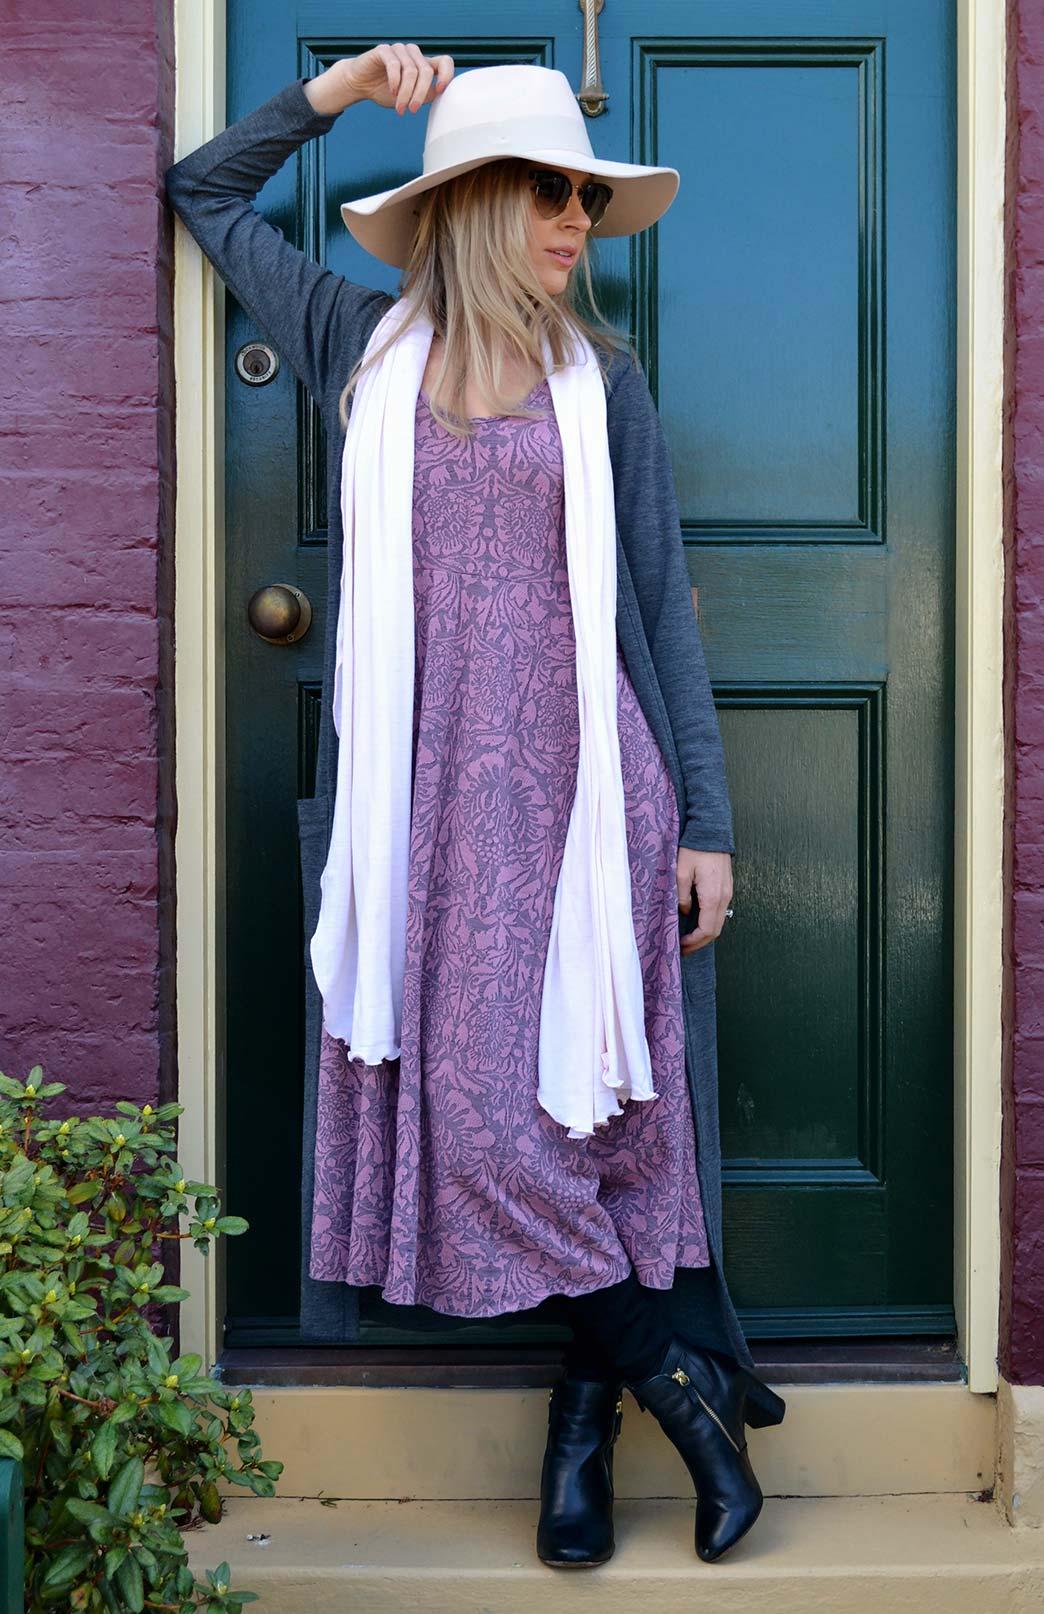 Fan Dress - Women's Pink Floral Woollen Dress with empire waistline - Smitten Merino Tasmania Australia